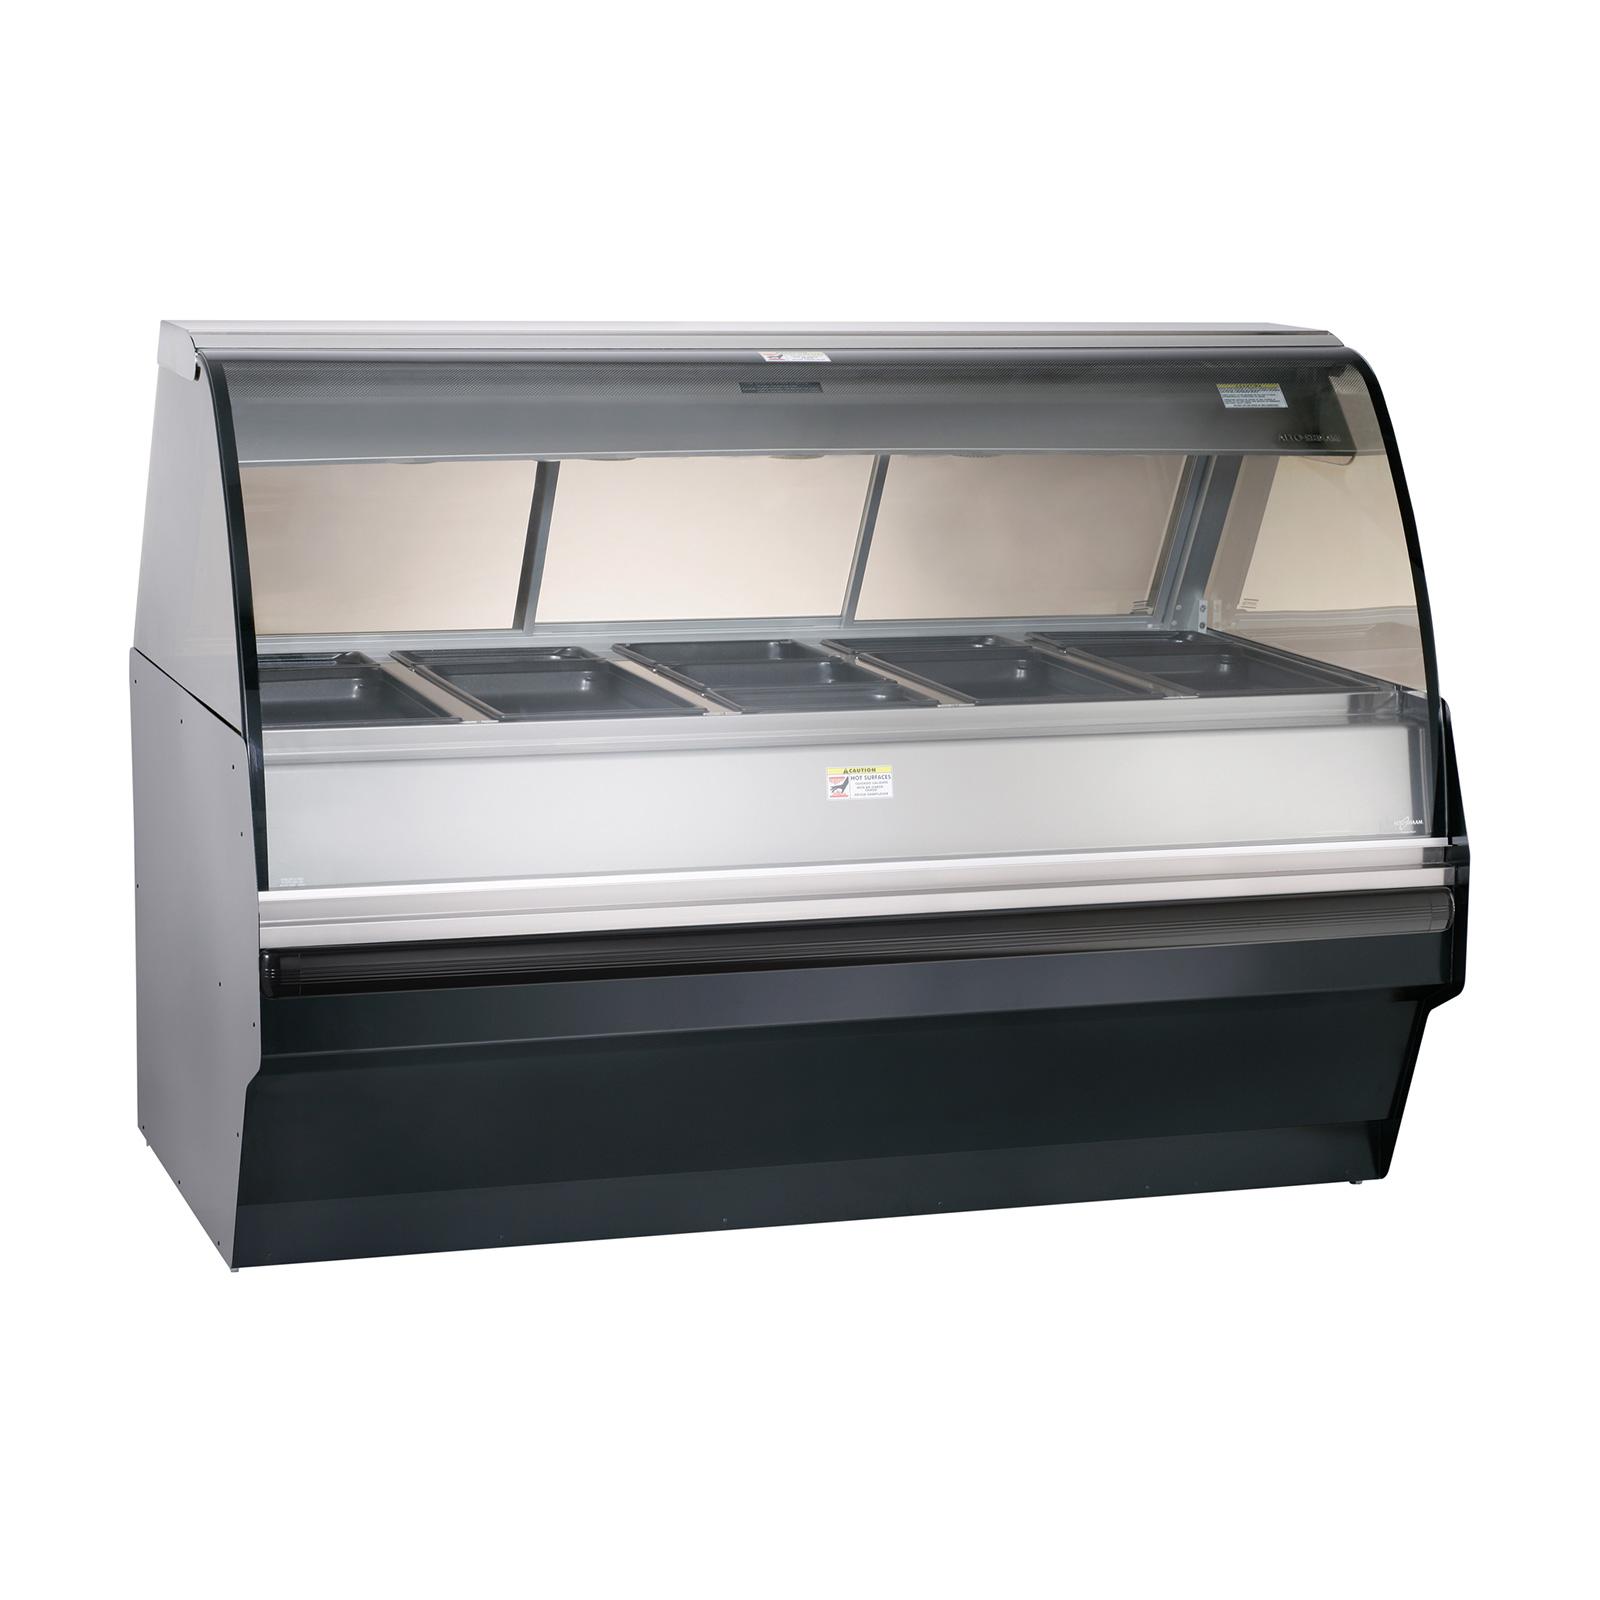 Alto-Shaam TY2SYS-72-SS display case, heated deli, floor model